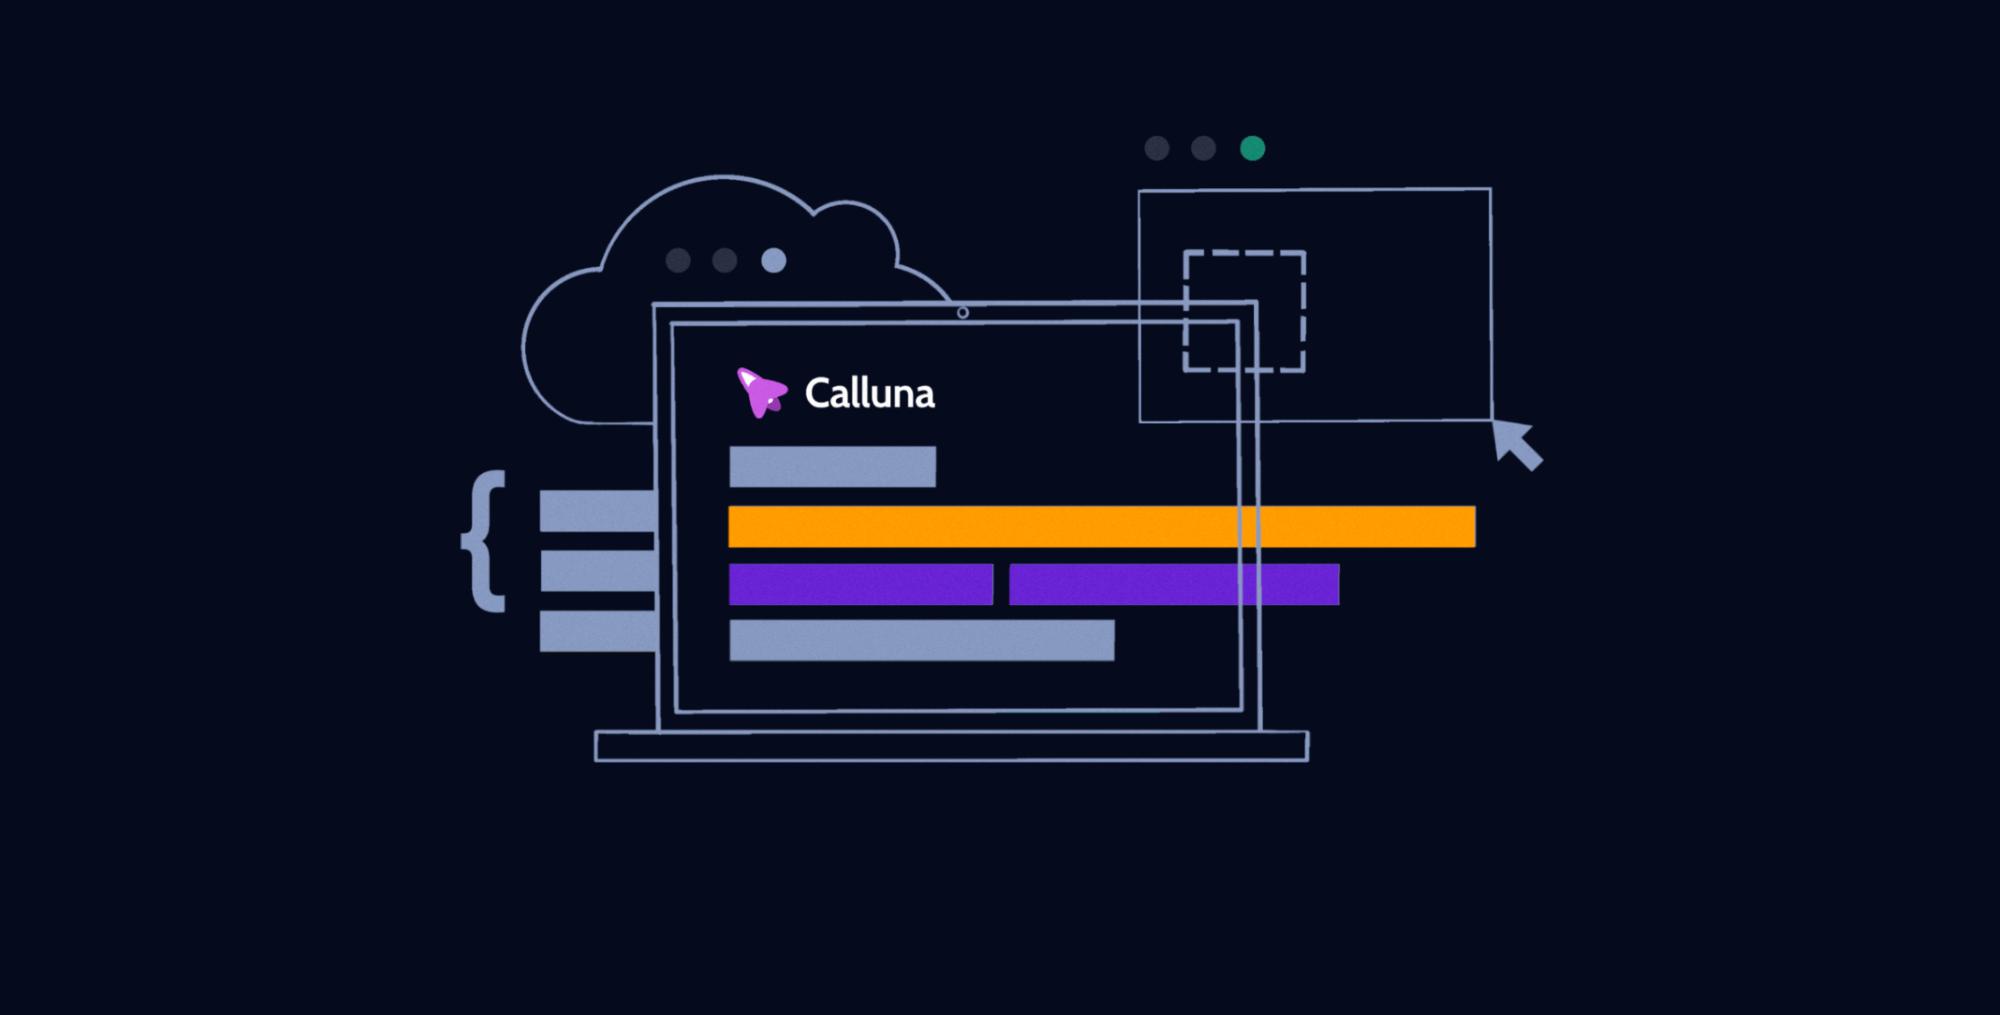 Calluna - Cloud Application developed by Netguru